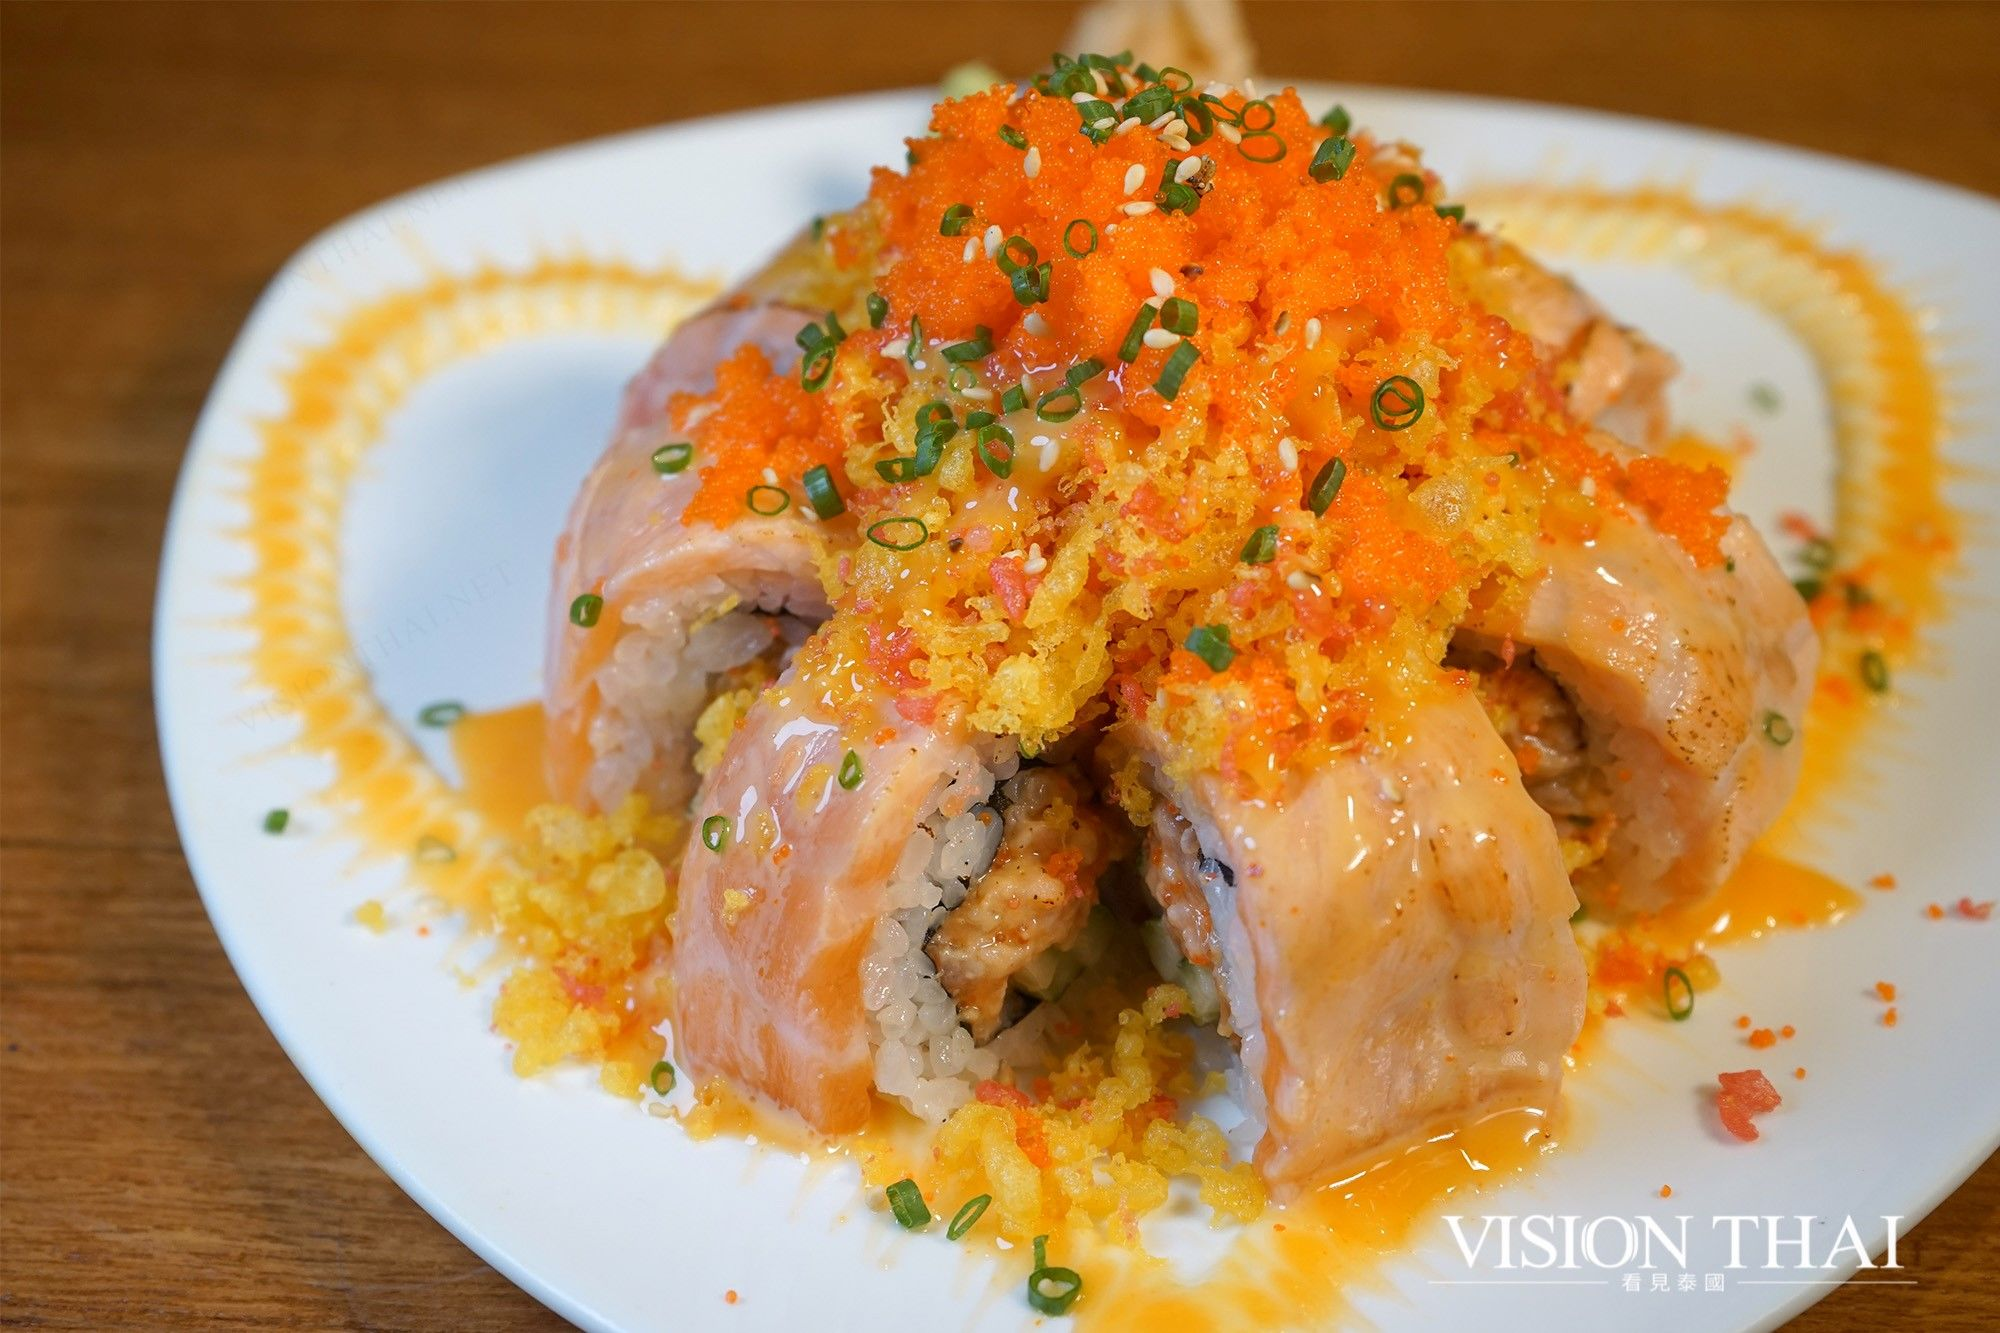 RCB 河岸餐廳 曼谷河城藝術古董中心 必吃 River Port Restaurant 亞洲融合式 河岸景觀餐廳